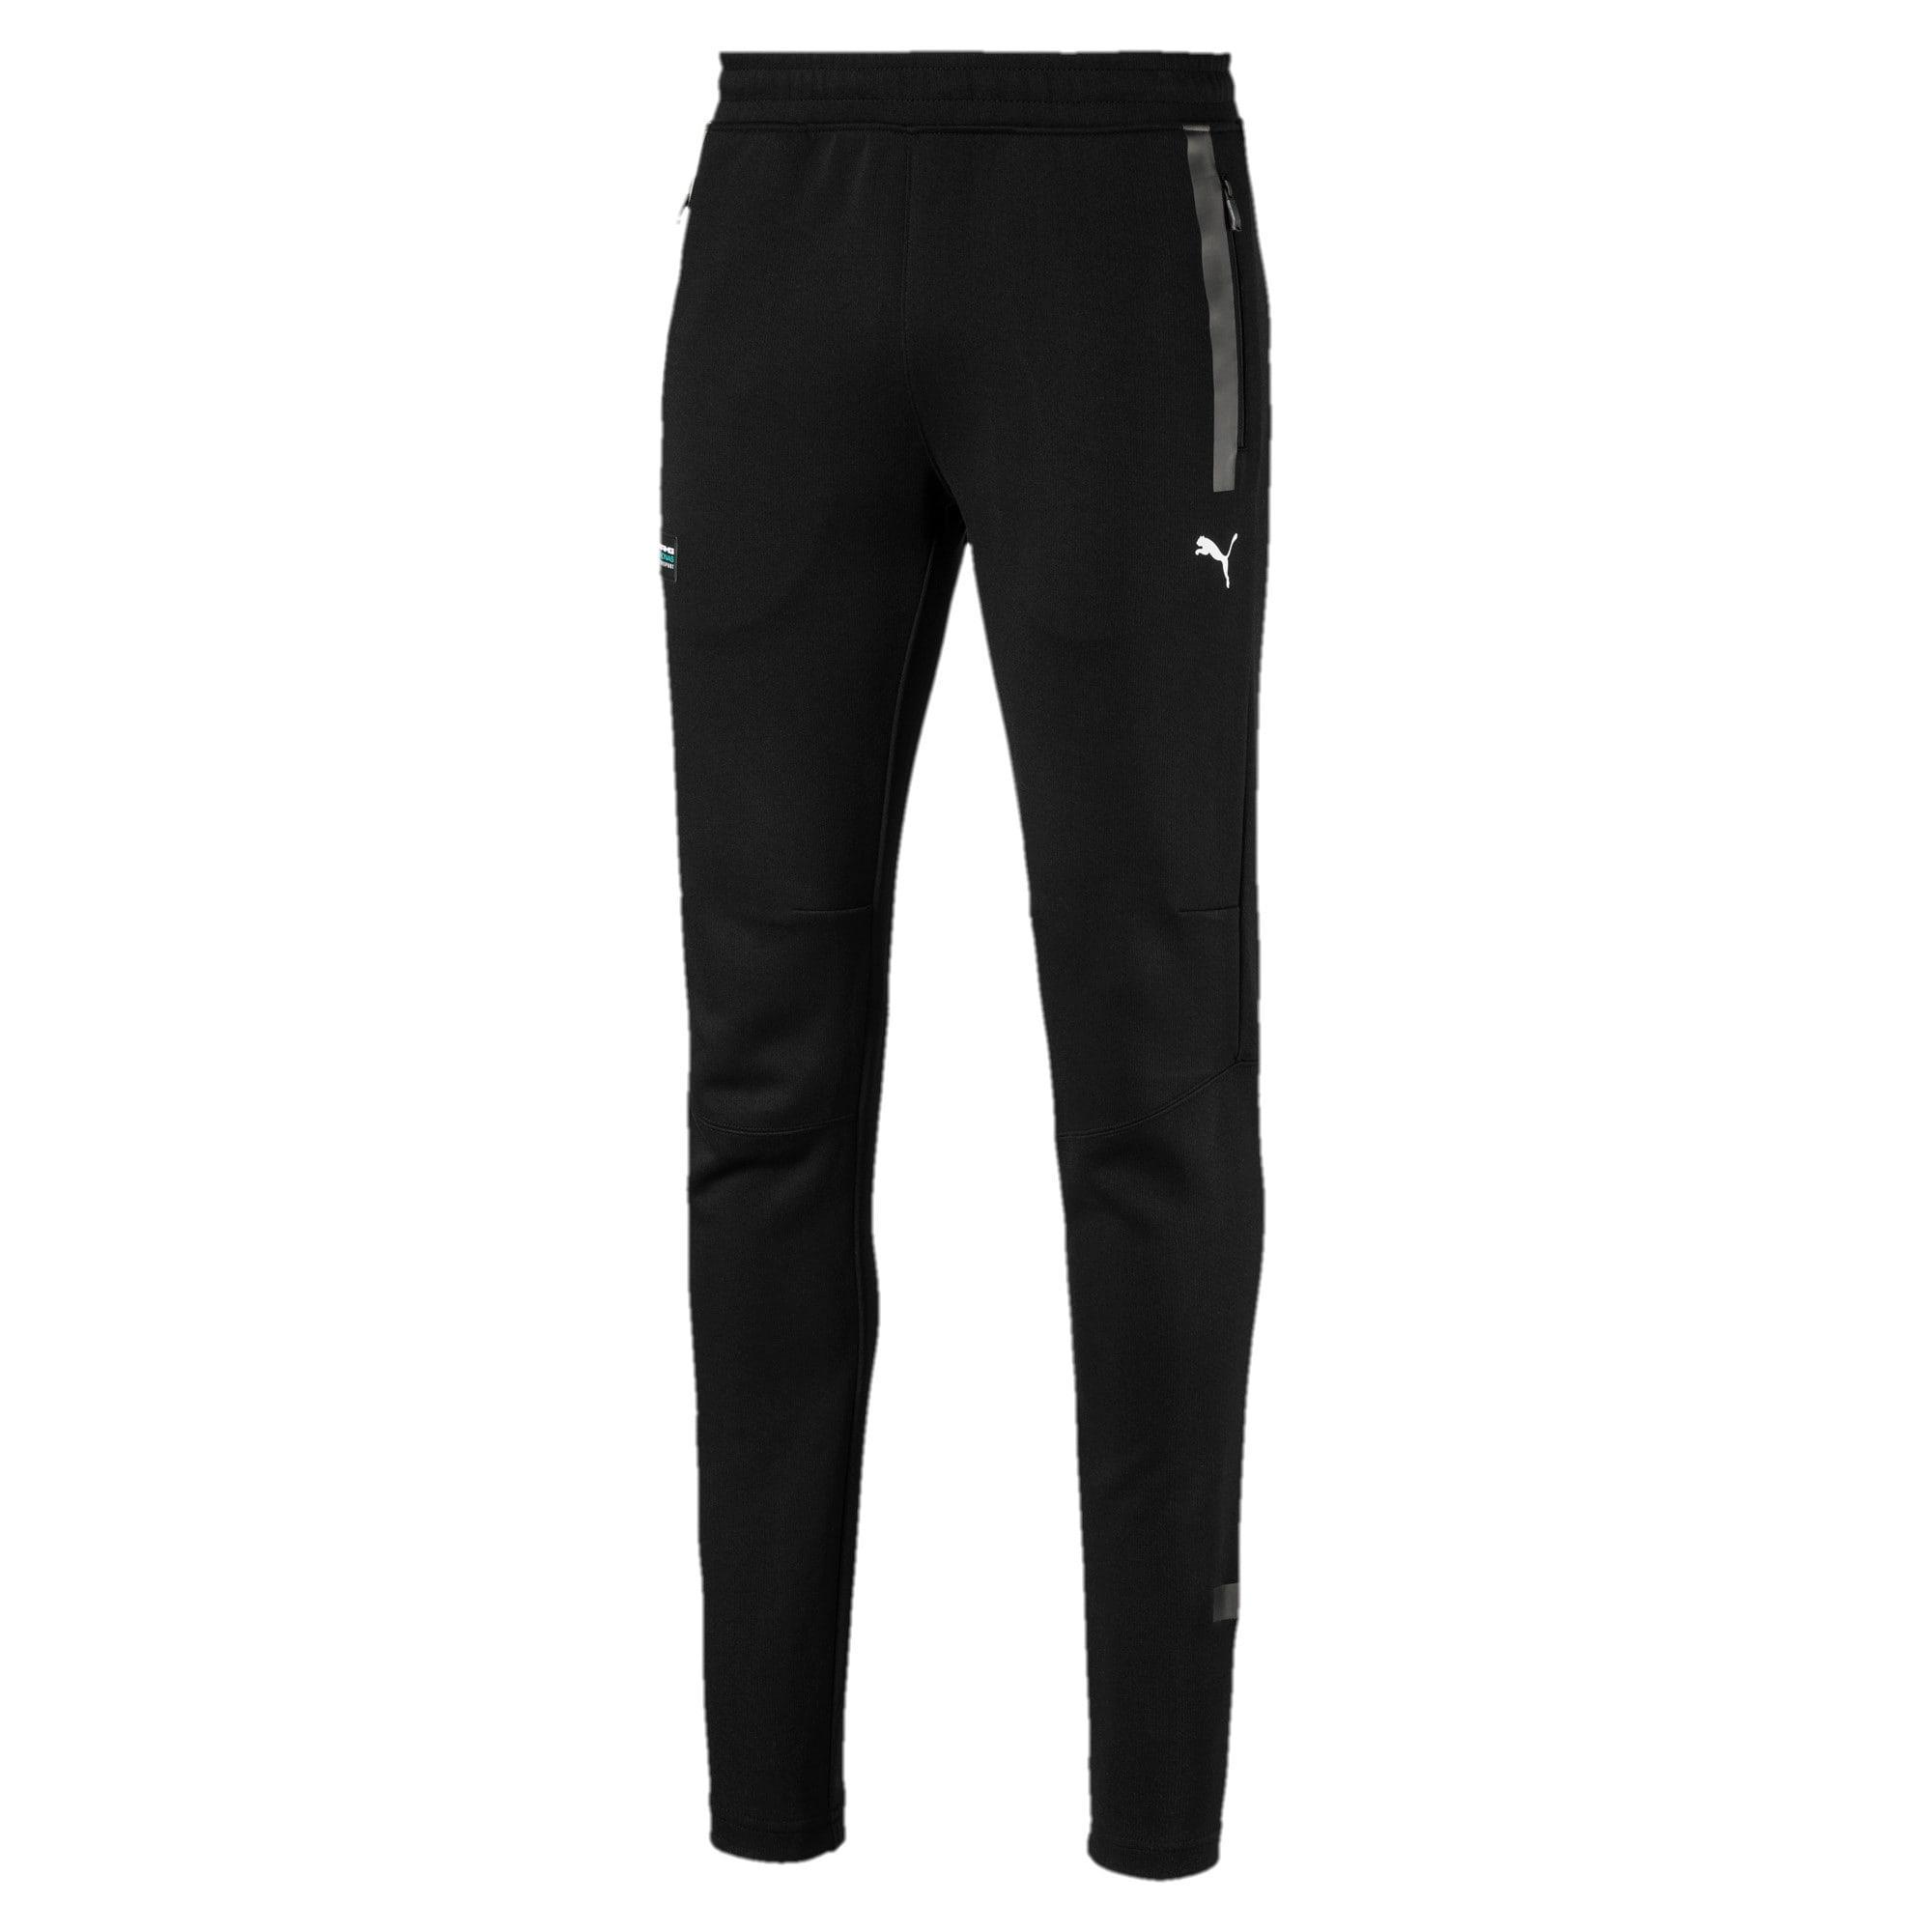 Thumbnail 4 of Mercedes AMG Petronas Knitted Men's Sweatpants, Puma Black, medium-IND